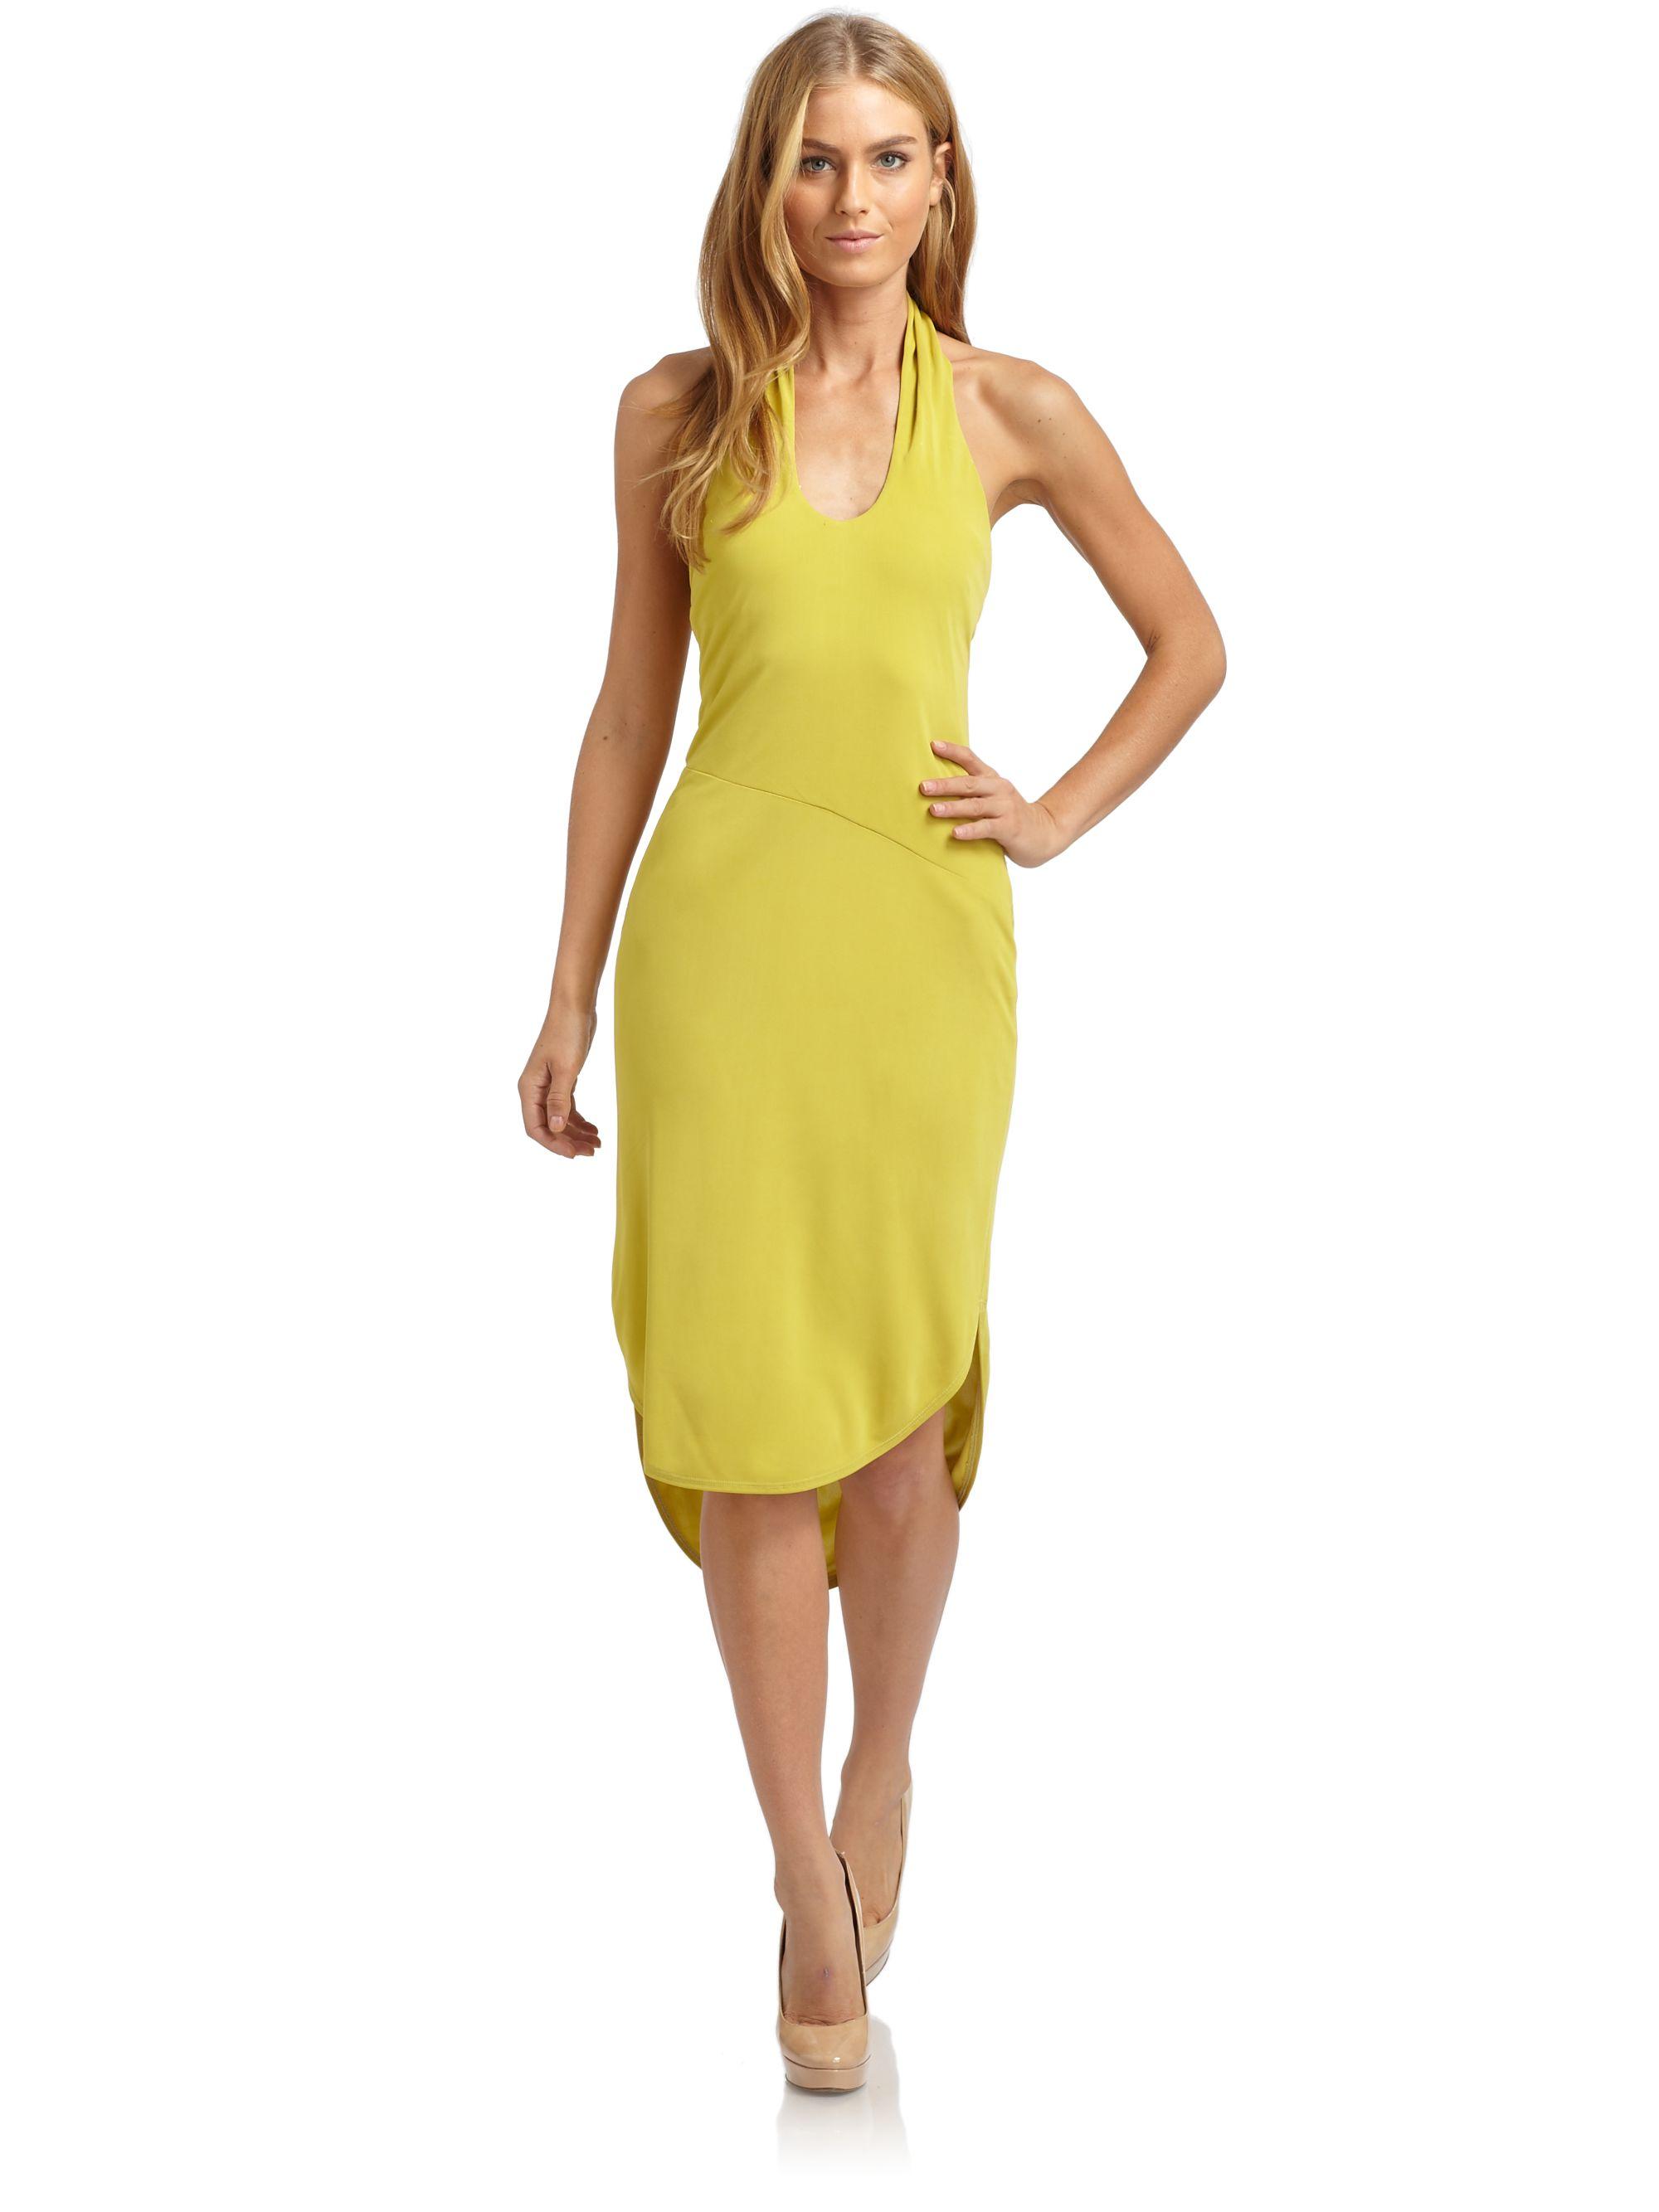 yellow halter dresses ... Kim Kardashian